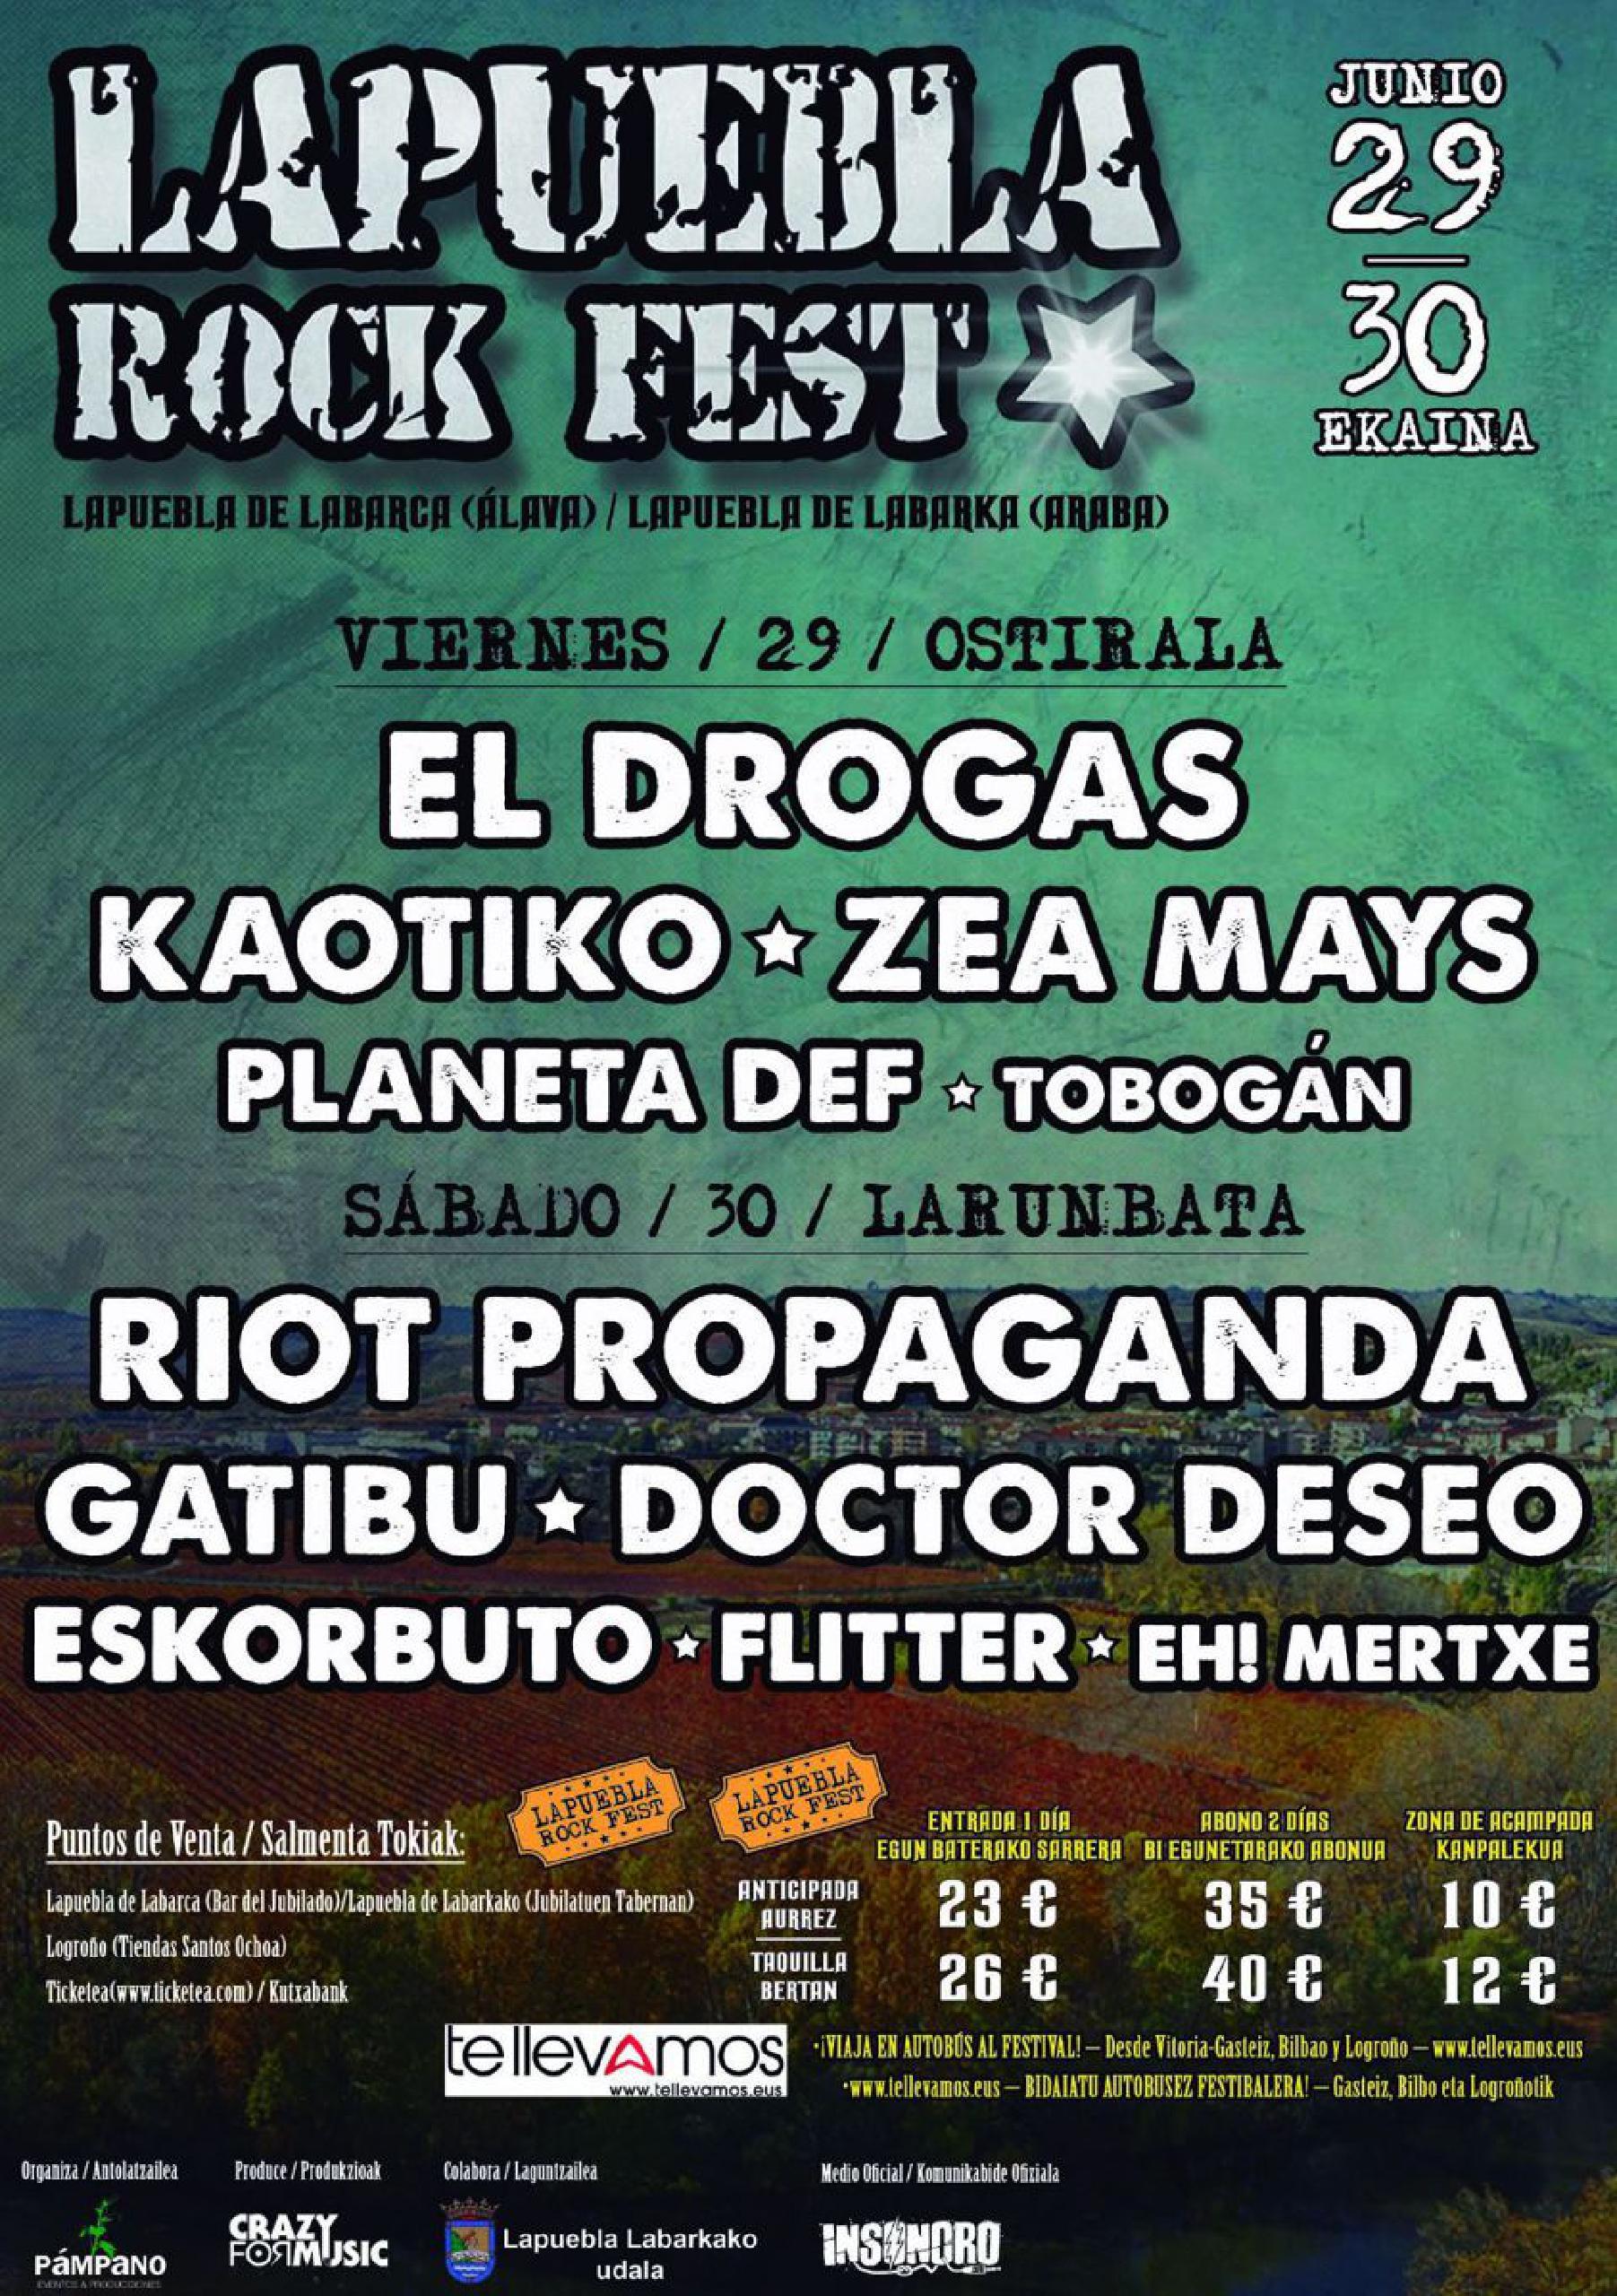 Cartel de Lapuebla Rock Fest